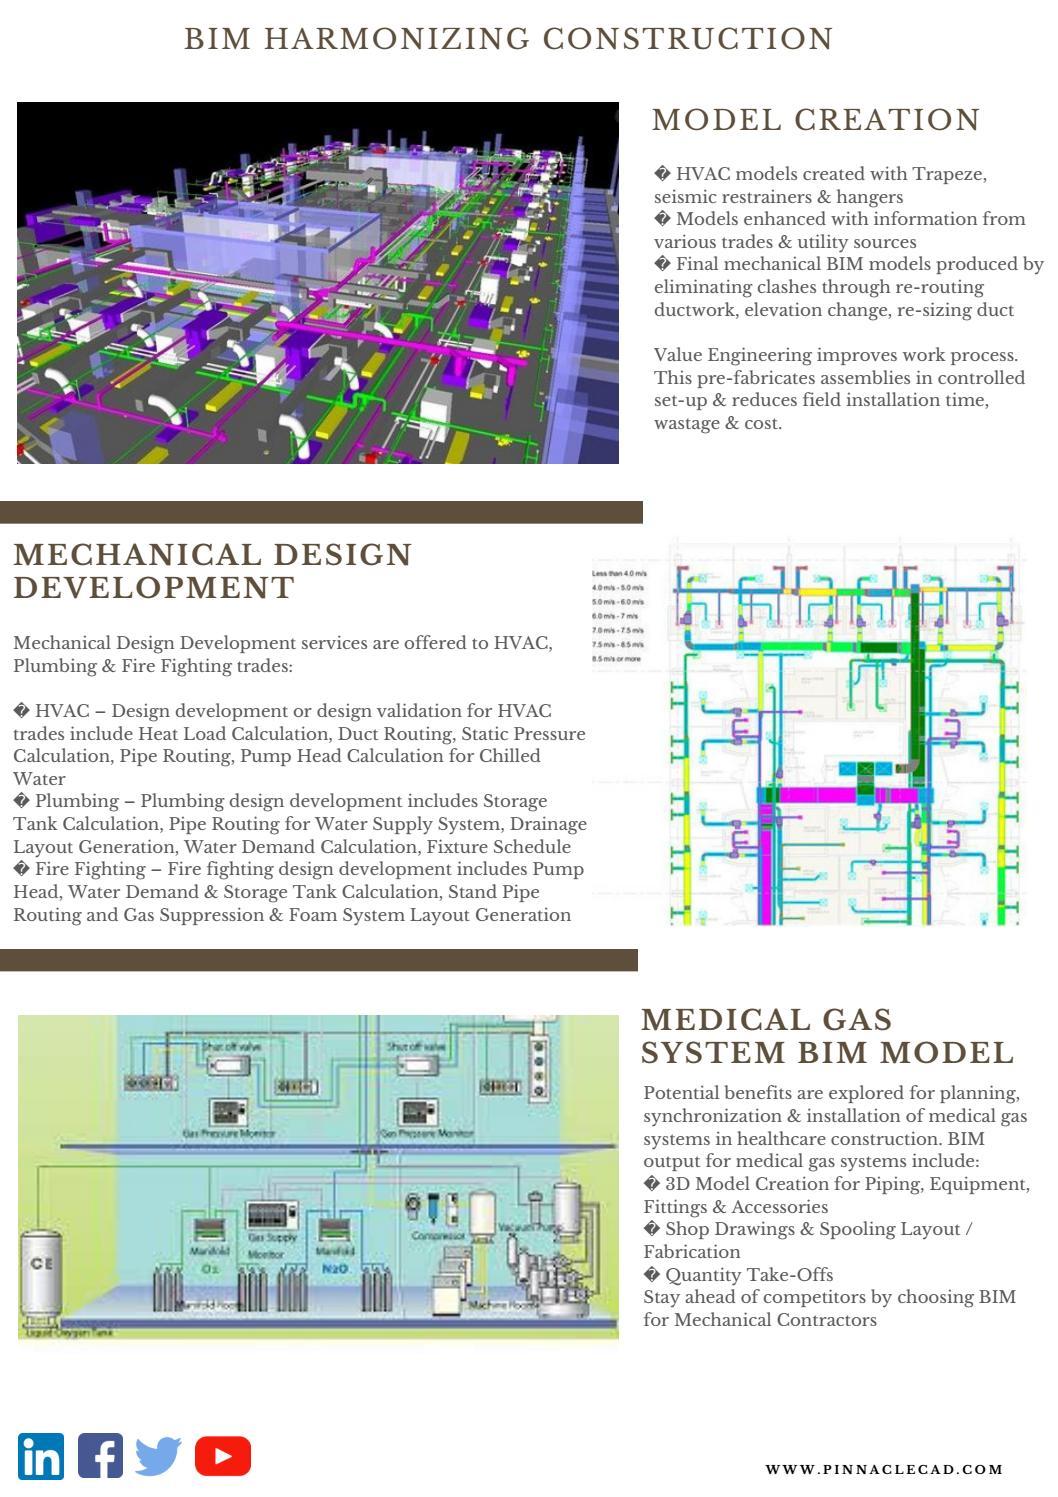 Bim harmonizing construction by Pinnacle Infotech Social Media - issuu